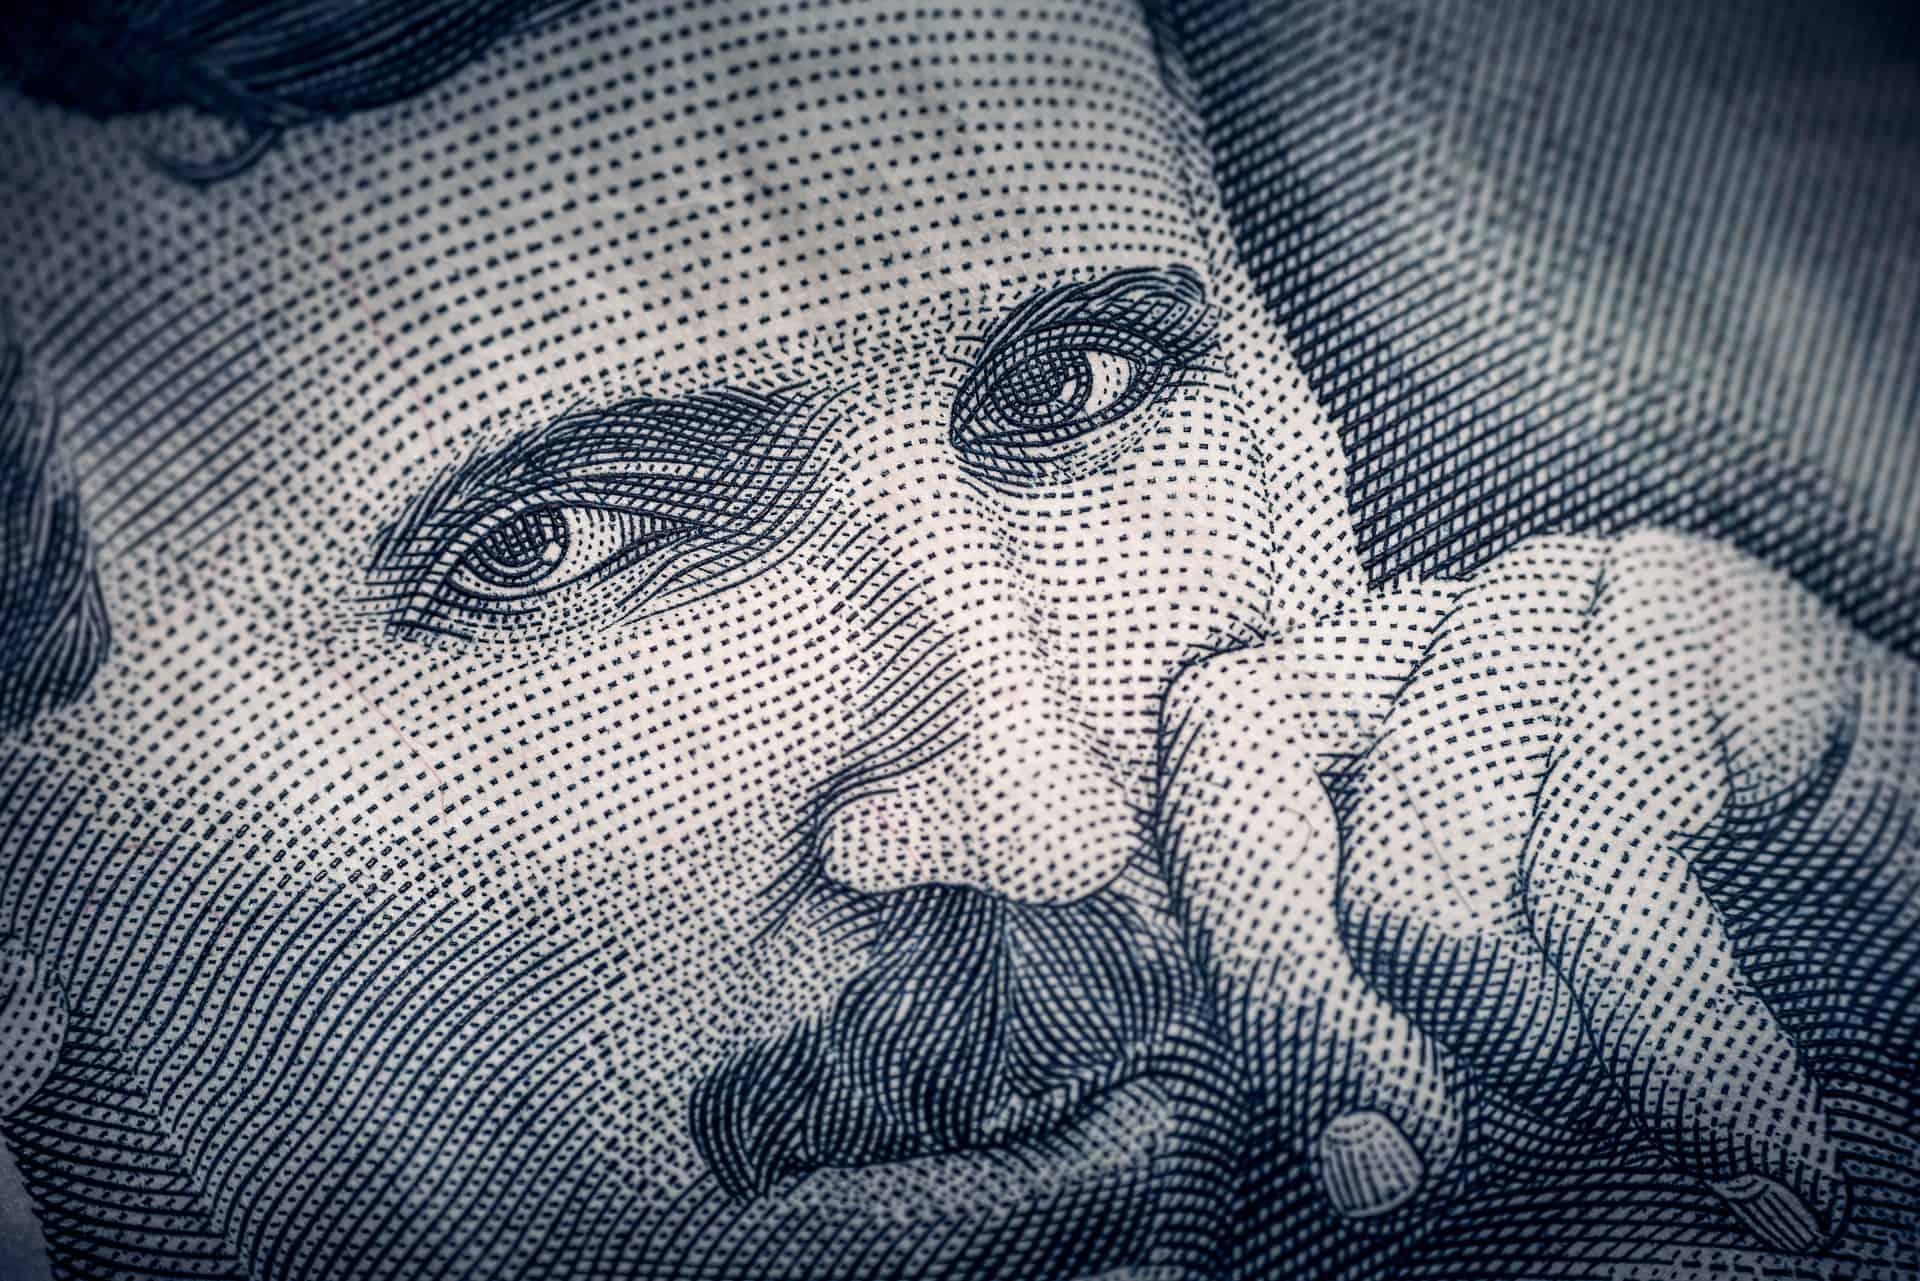 Is Elon Musk Related to Nikola Tesla? - Celeb Answers